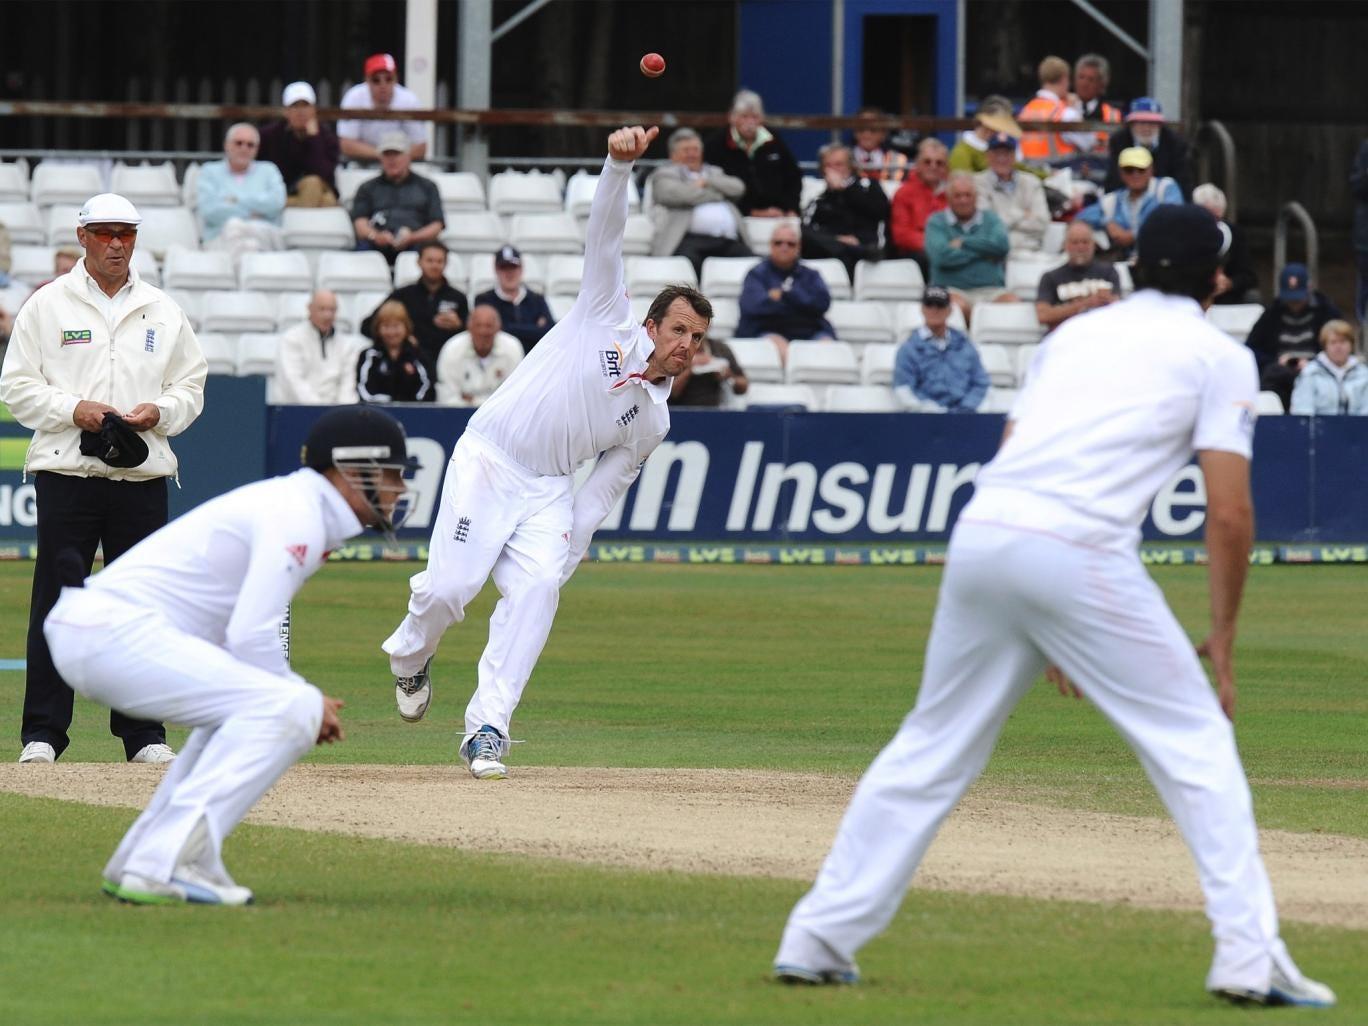 Graeme Swann bowls during England's match against Essex in Chelmsford